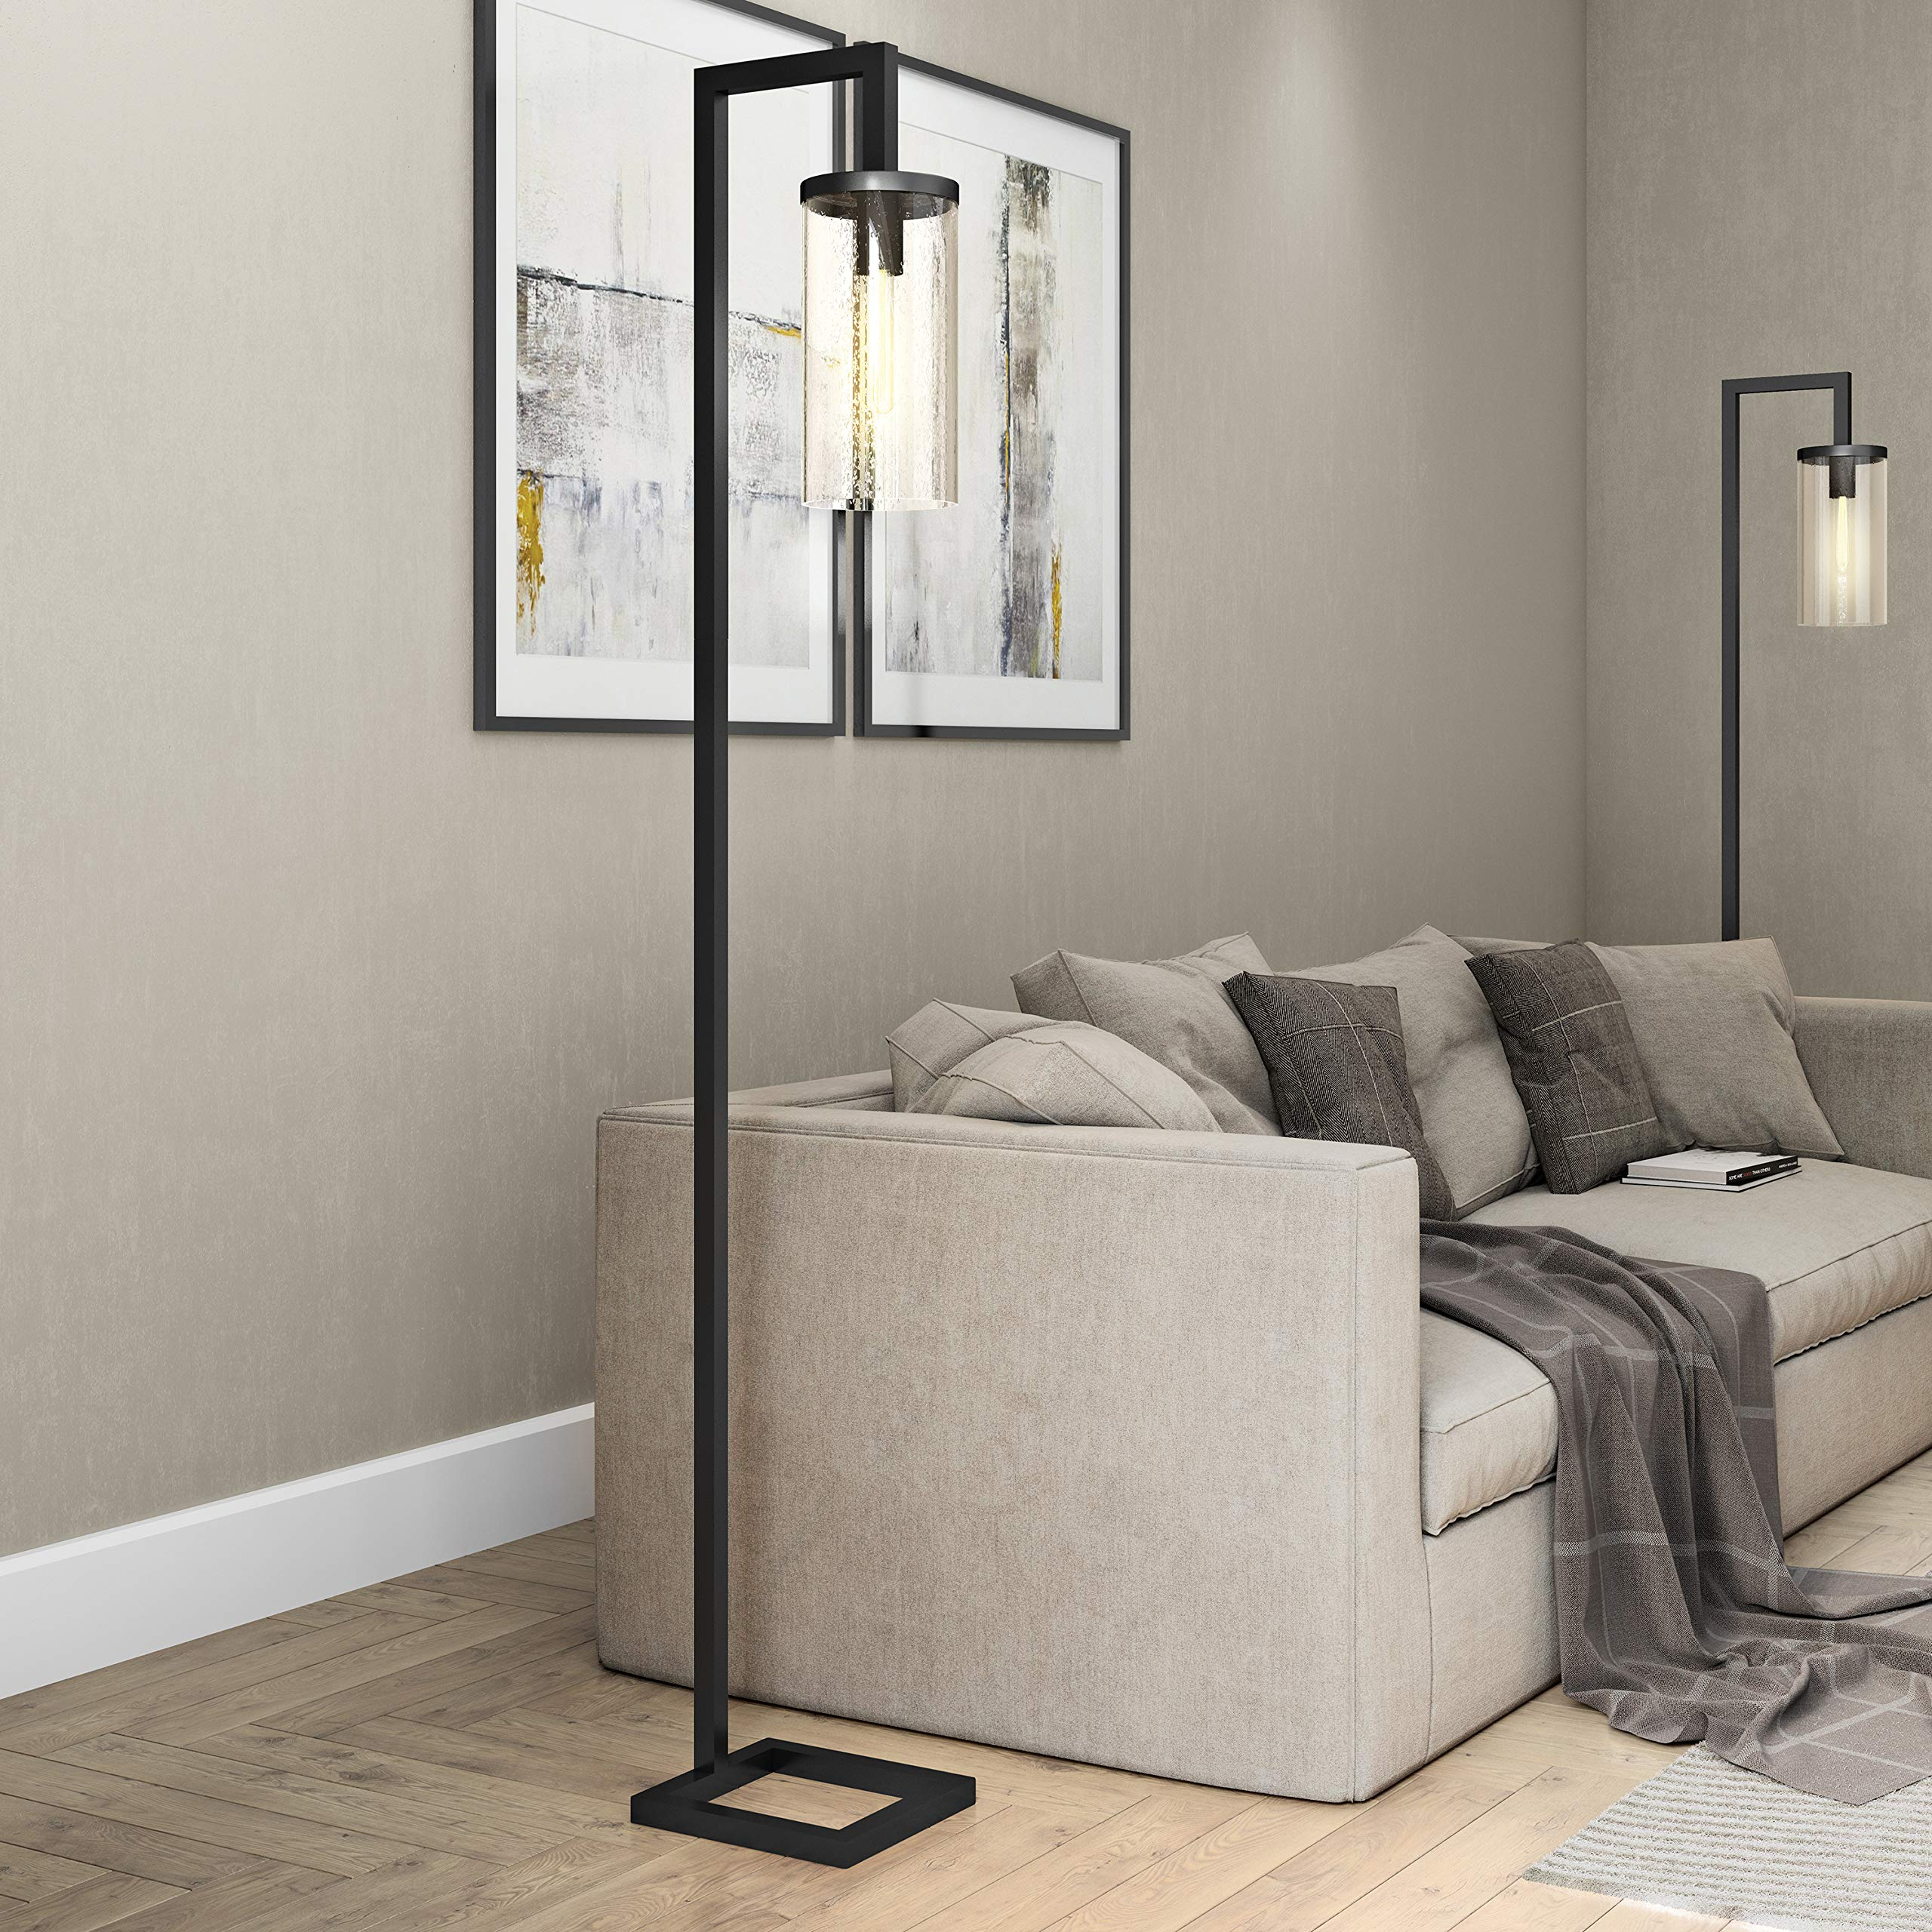 Henn&Hart FL0014 Modern Farmhouse seeded Task Lamp, One Size, Black by Henn&Hart